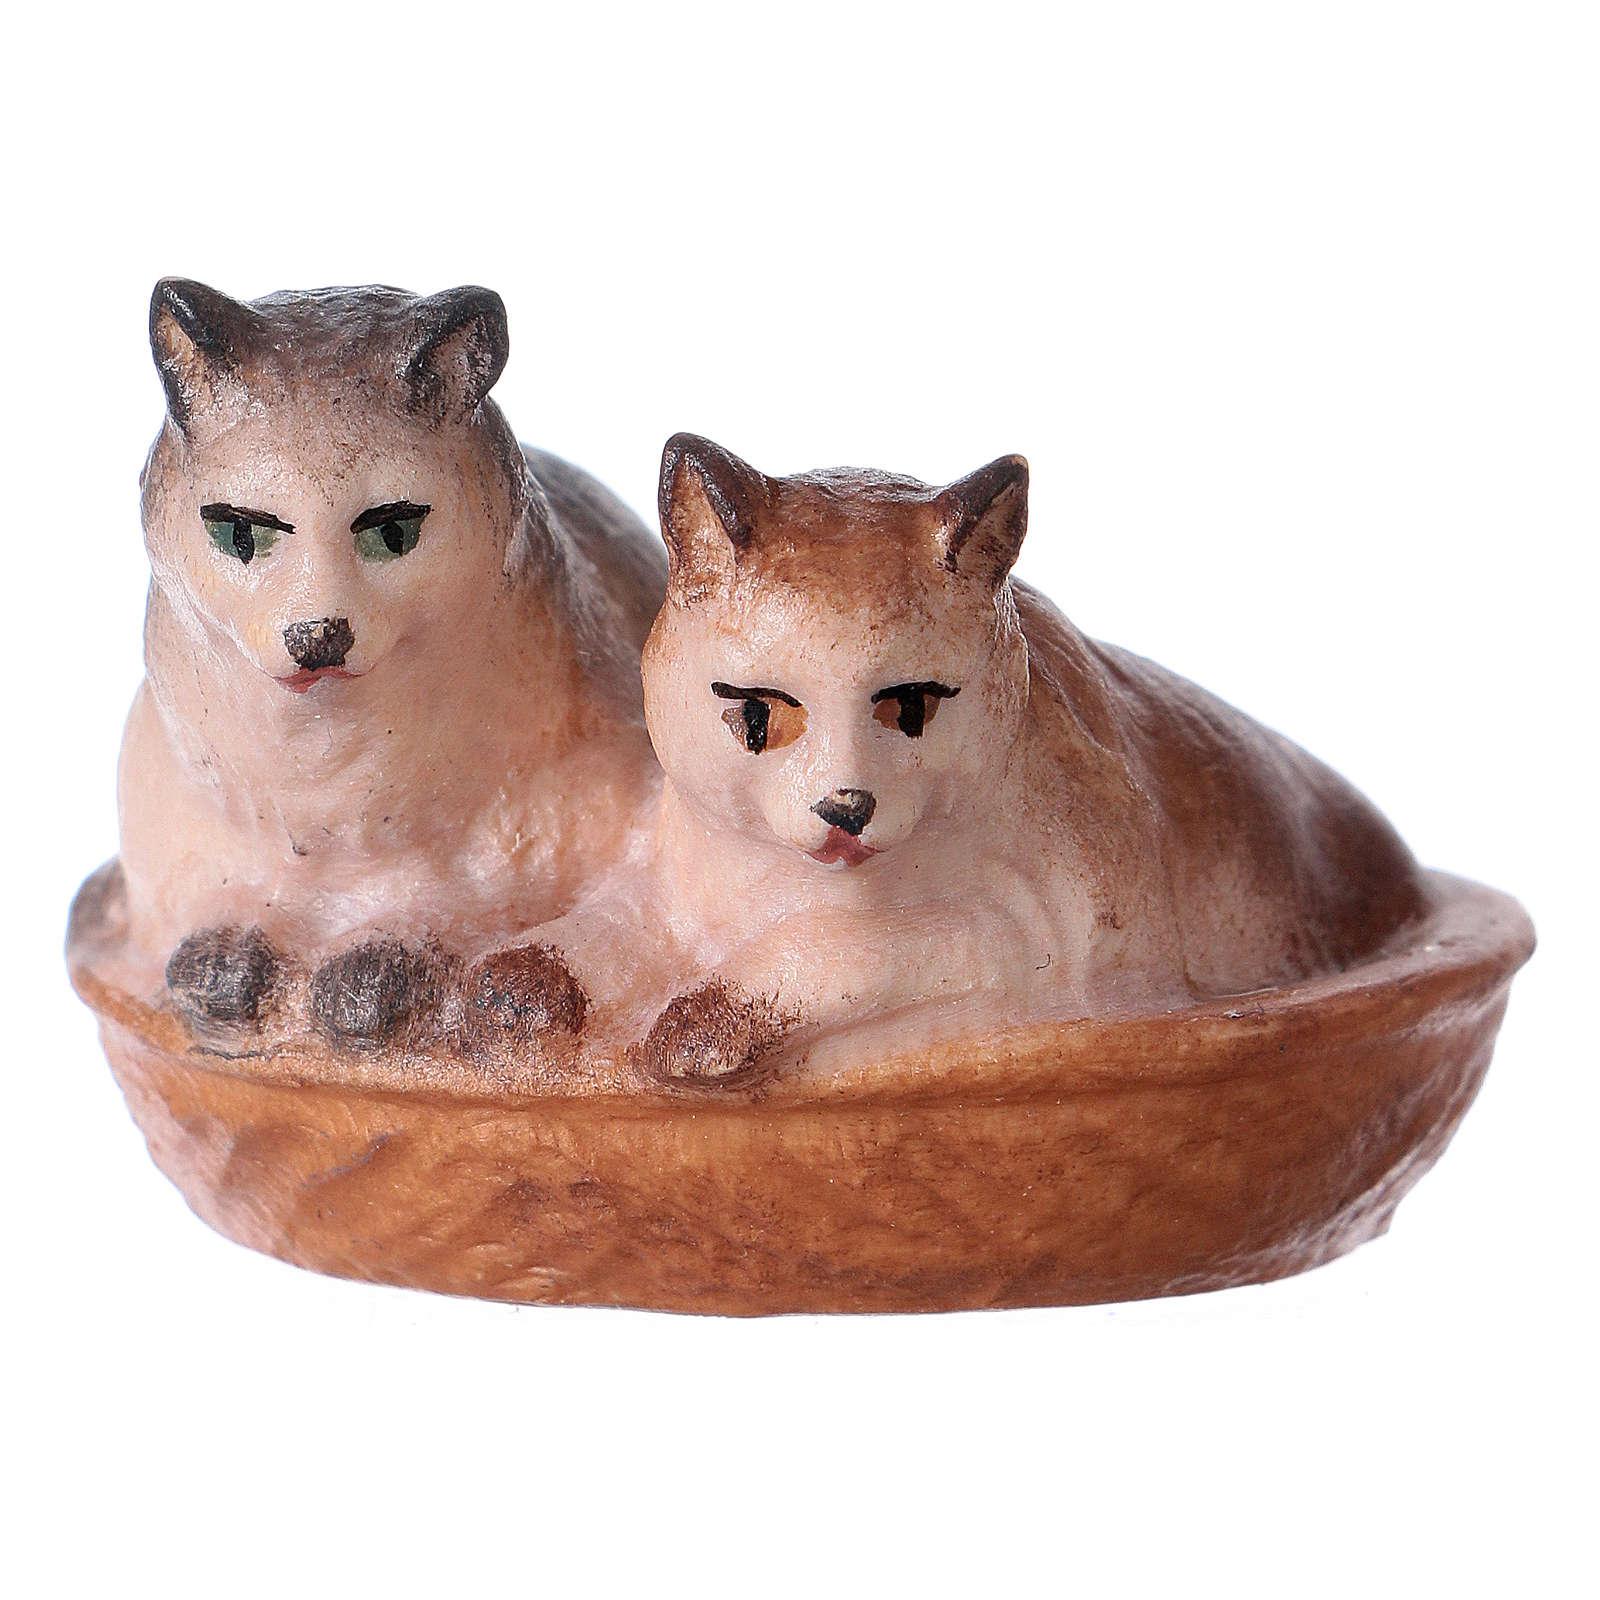 Gatti nel cesto presepe Original legno dipinto Valgardena 12 cm 4